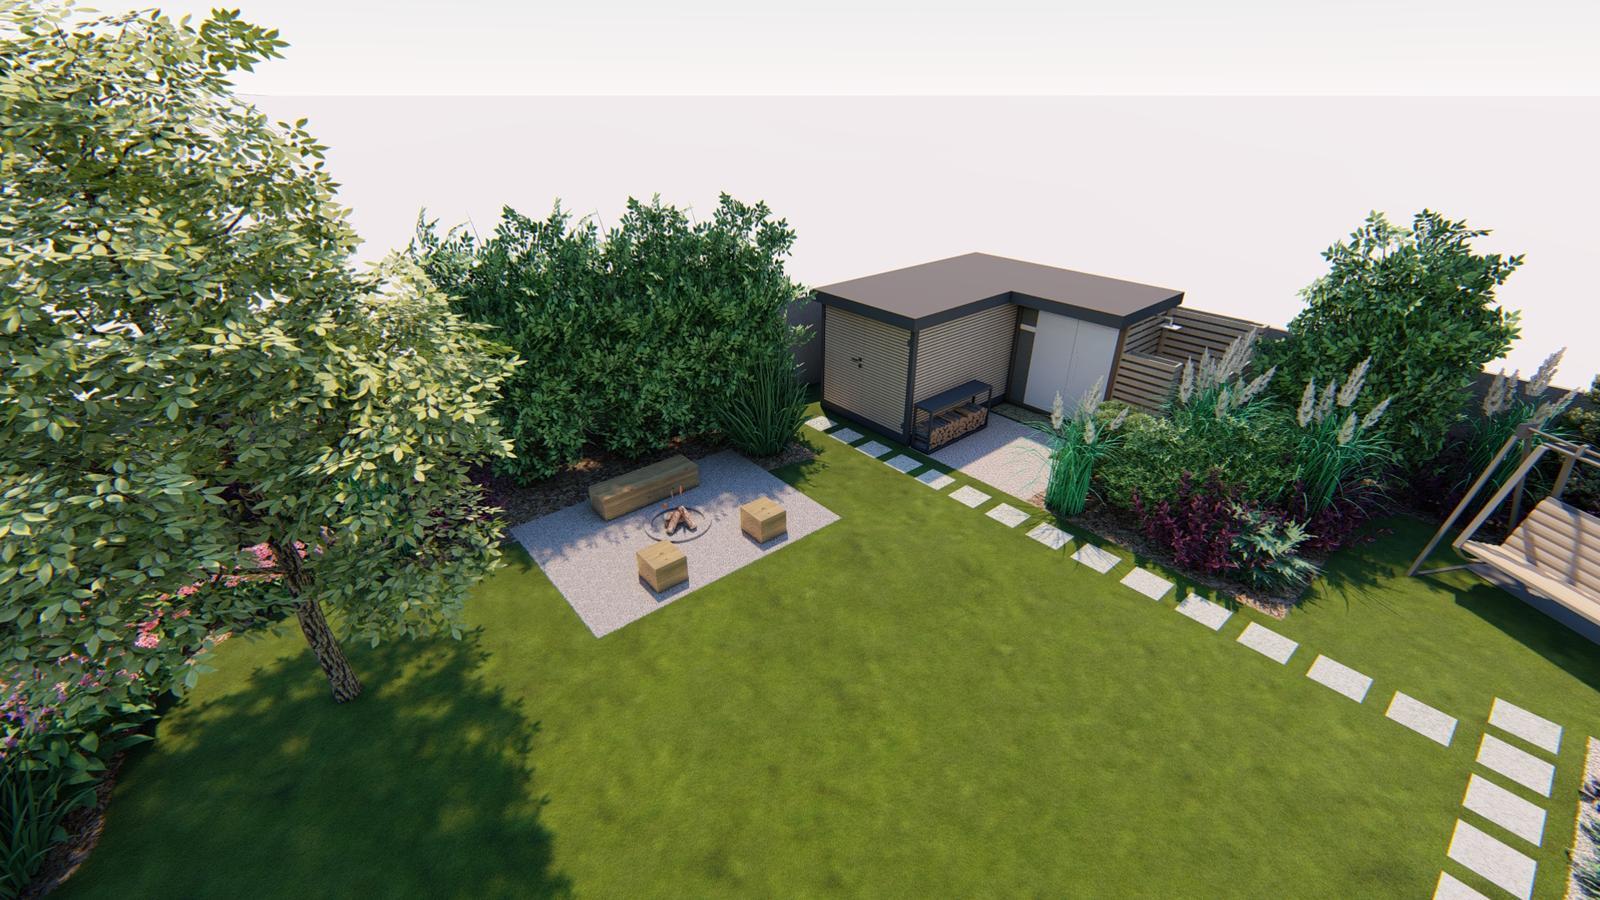 Návrh záhrady rodinného domu - Obrázok č. 25